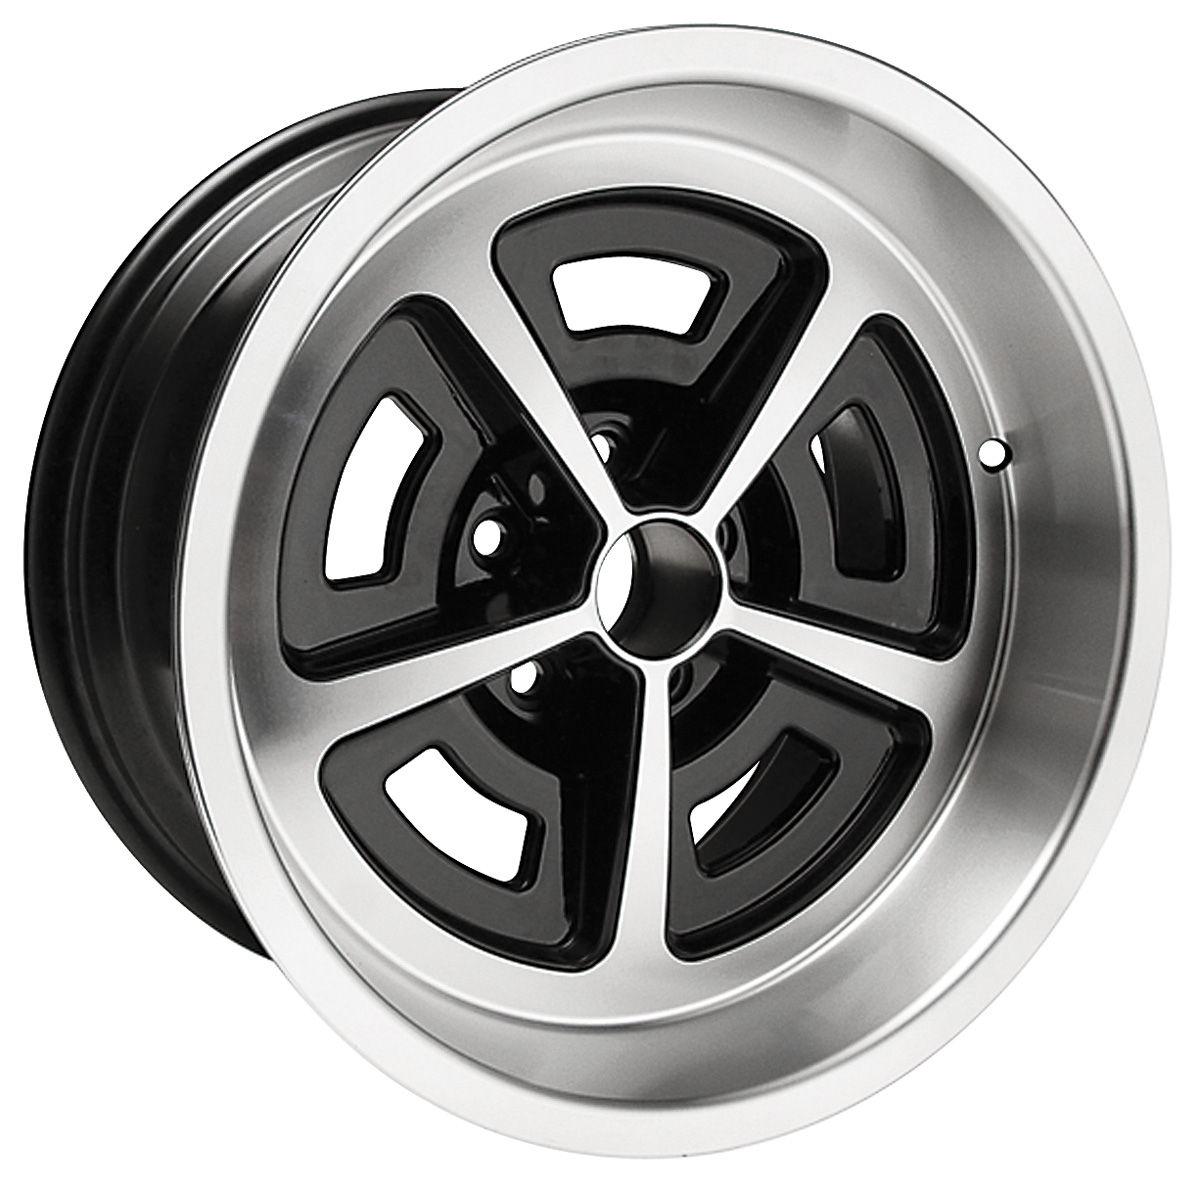 Oldsmobile Rally 17 Inch Wheels